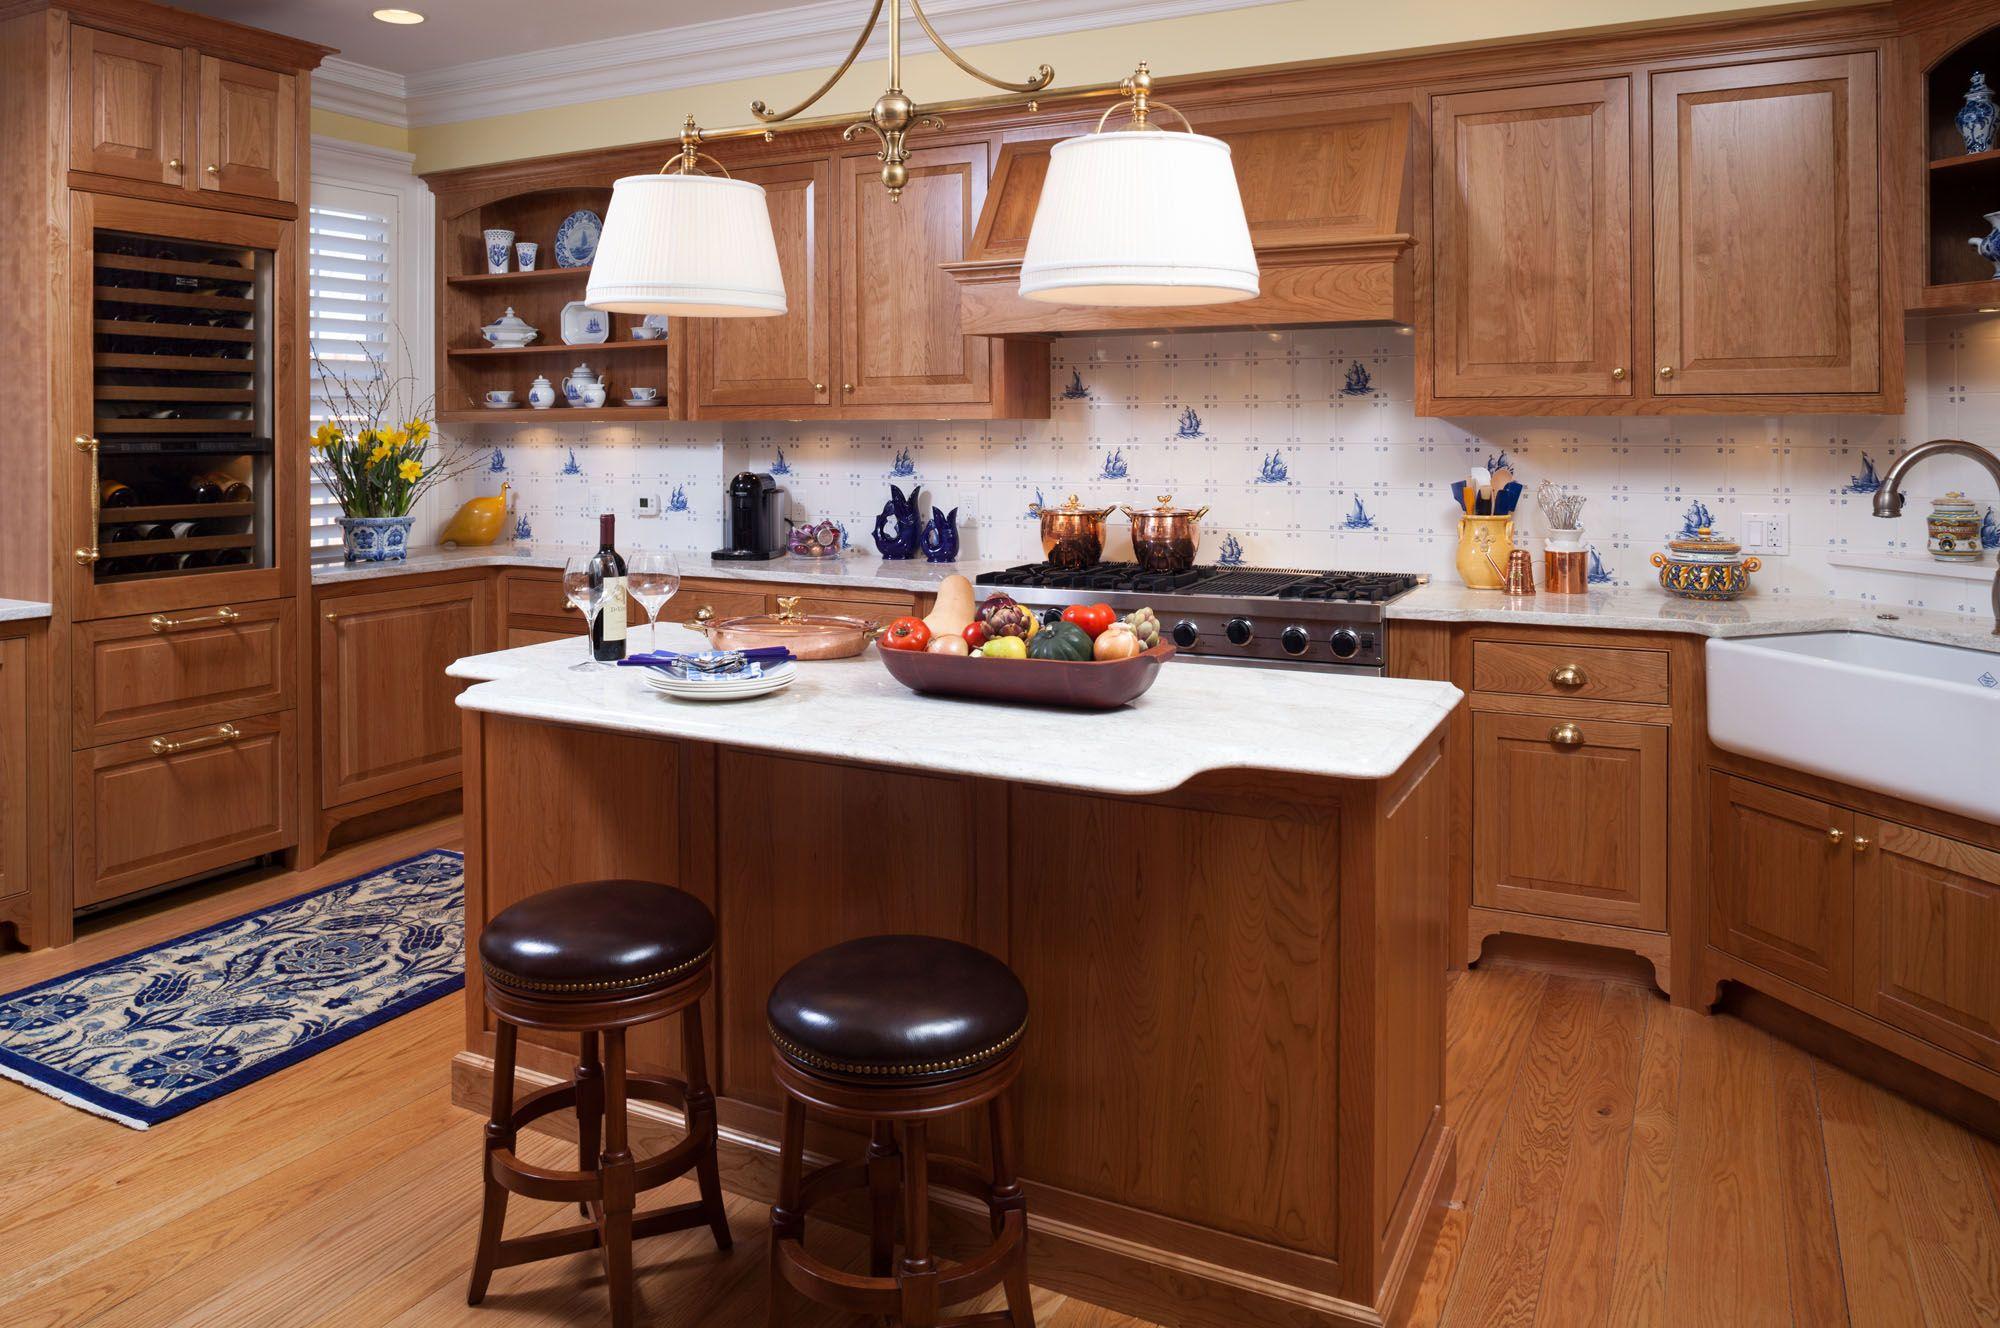 Cebula Design Kitchen In Newburyport Ma #cebuladesign Awesome Kitchen Design Massachusetts Design Inspiration